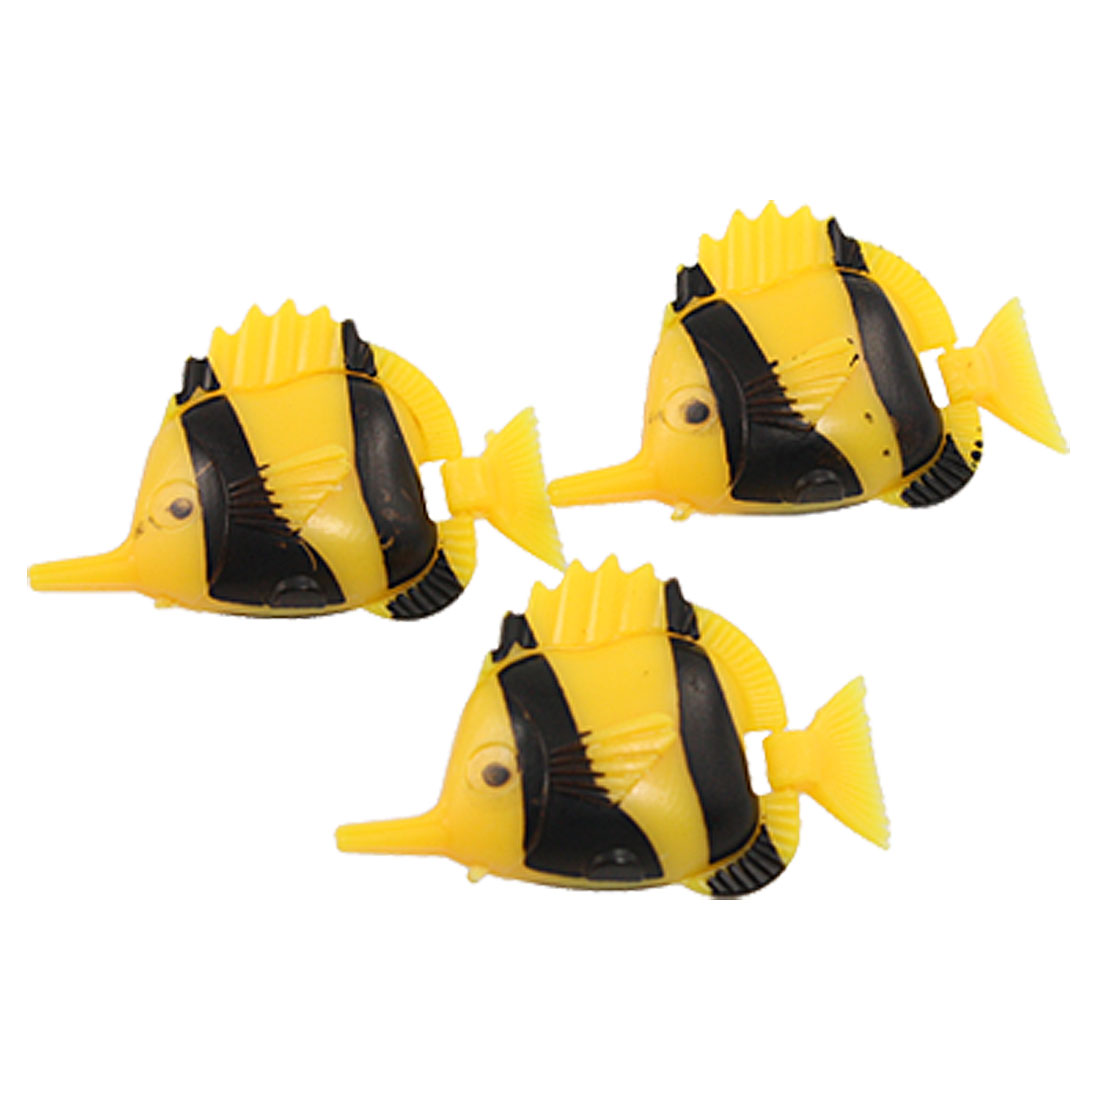 3 Pcs Flexible Tail Swimming Yellow Black Plastic Fish for Aquarium